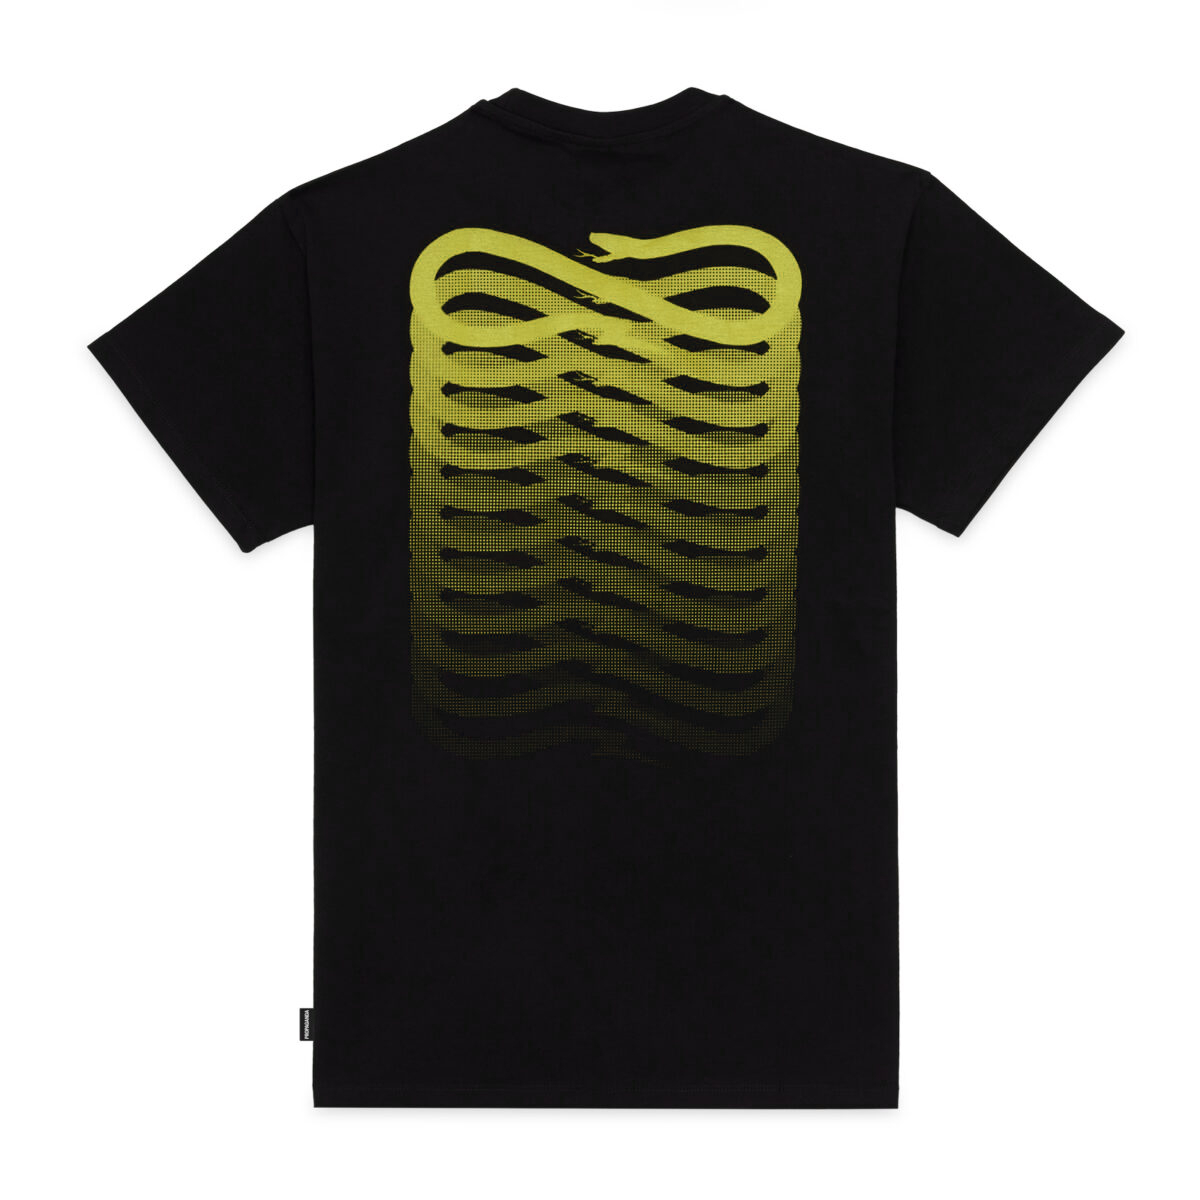 T-shirt Propaganda RIBS Tee SS21 Black